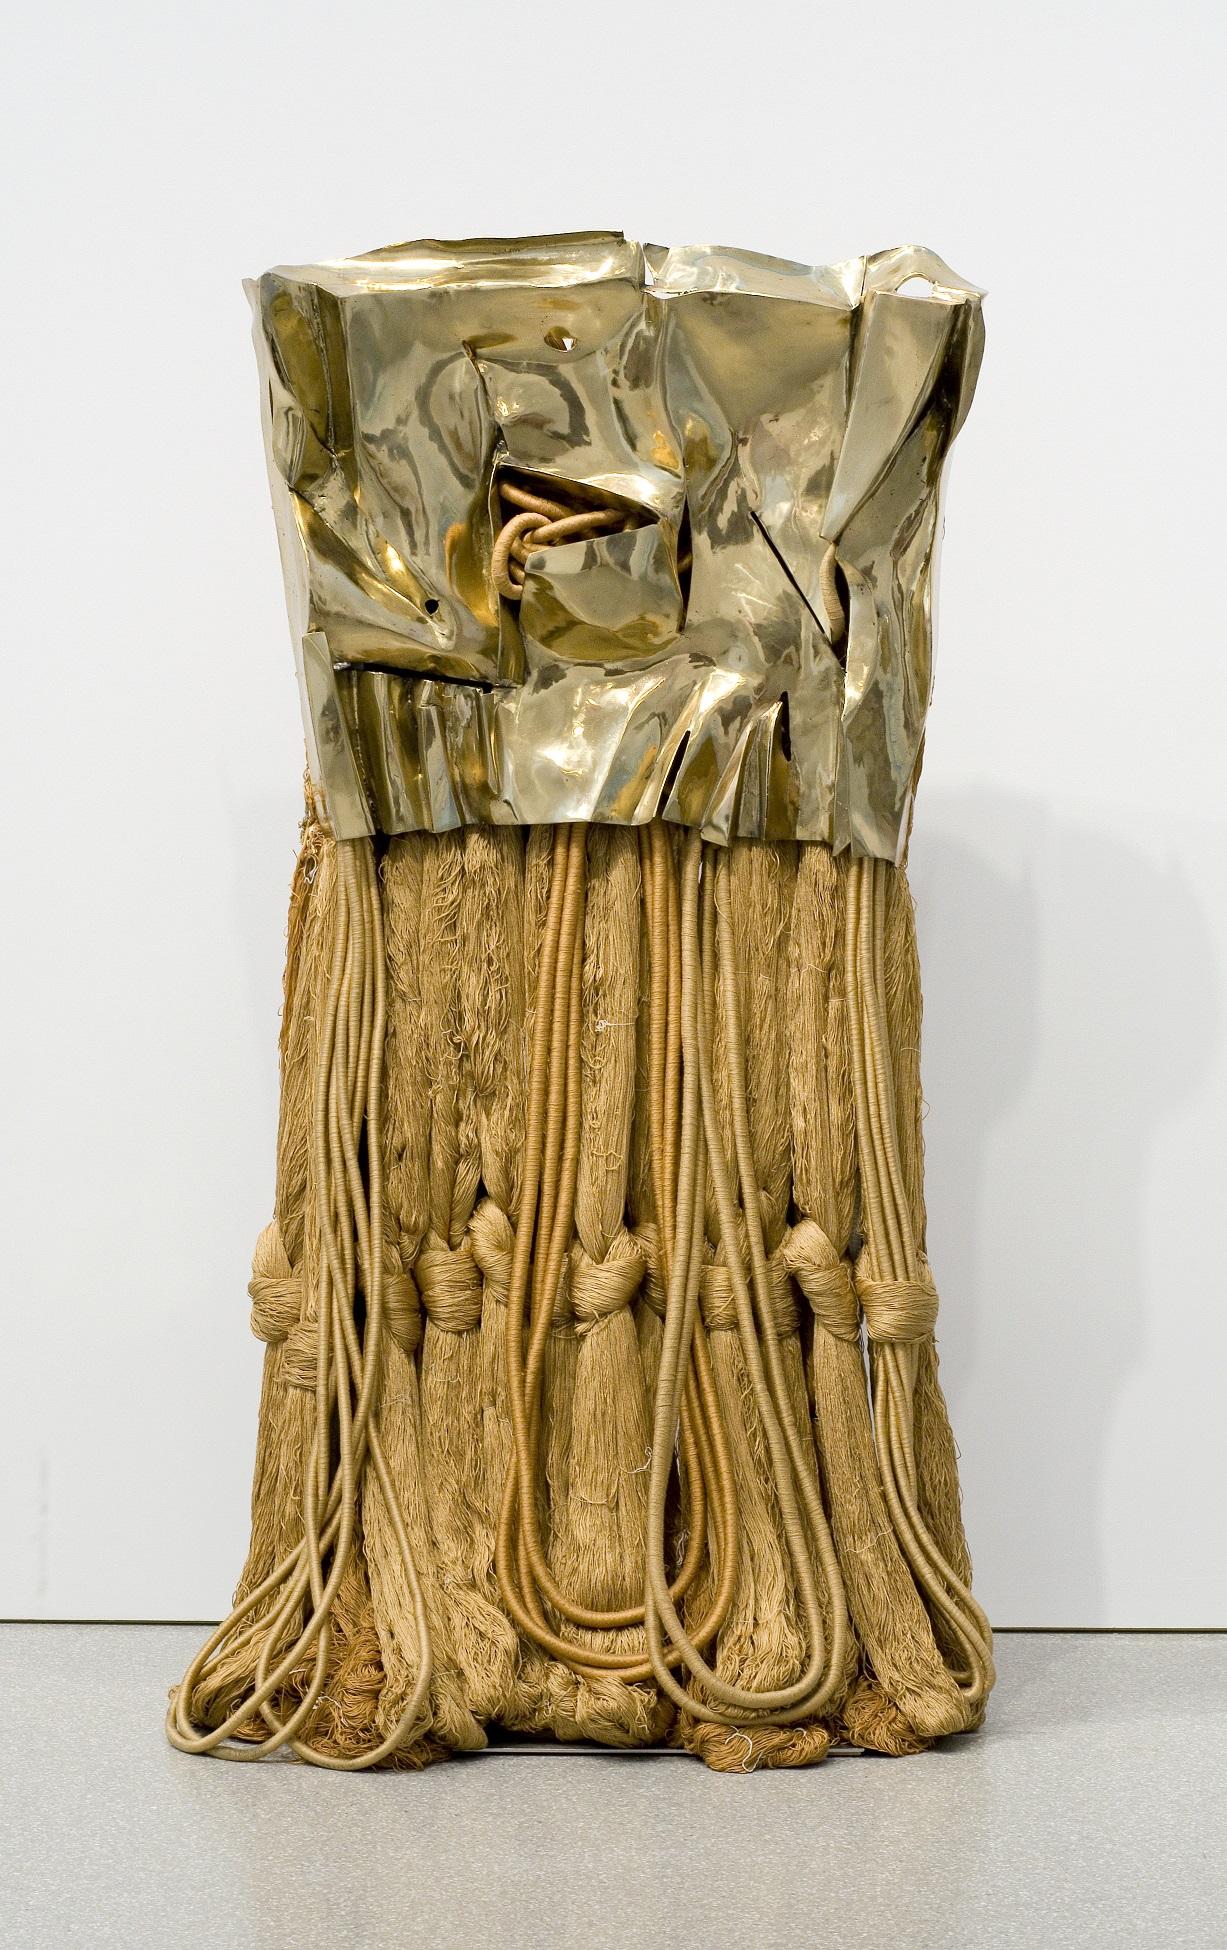 Barbara Chase-Riboud, Little Gold Flag , 2007 (on display at Stony Island Arts Bank) Courtesy of Michael Rosenfeld Gallery LLC, New York, NY